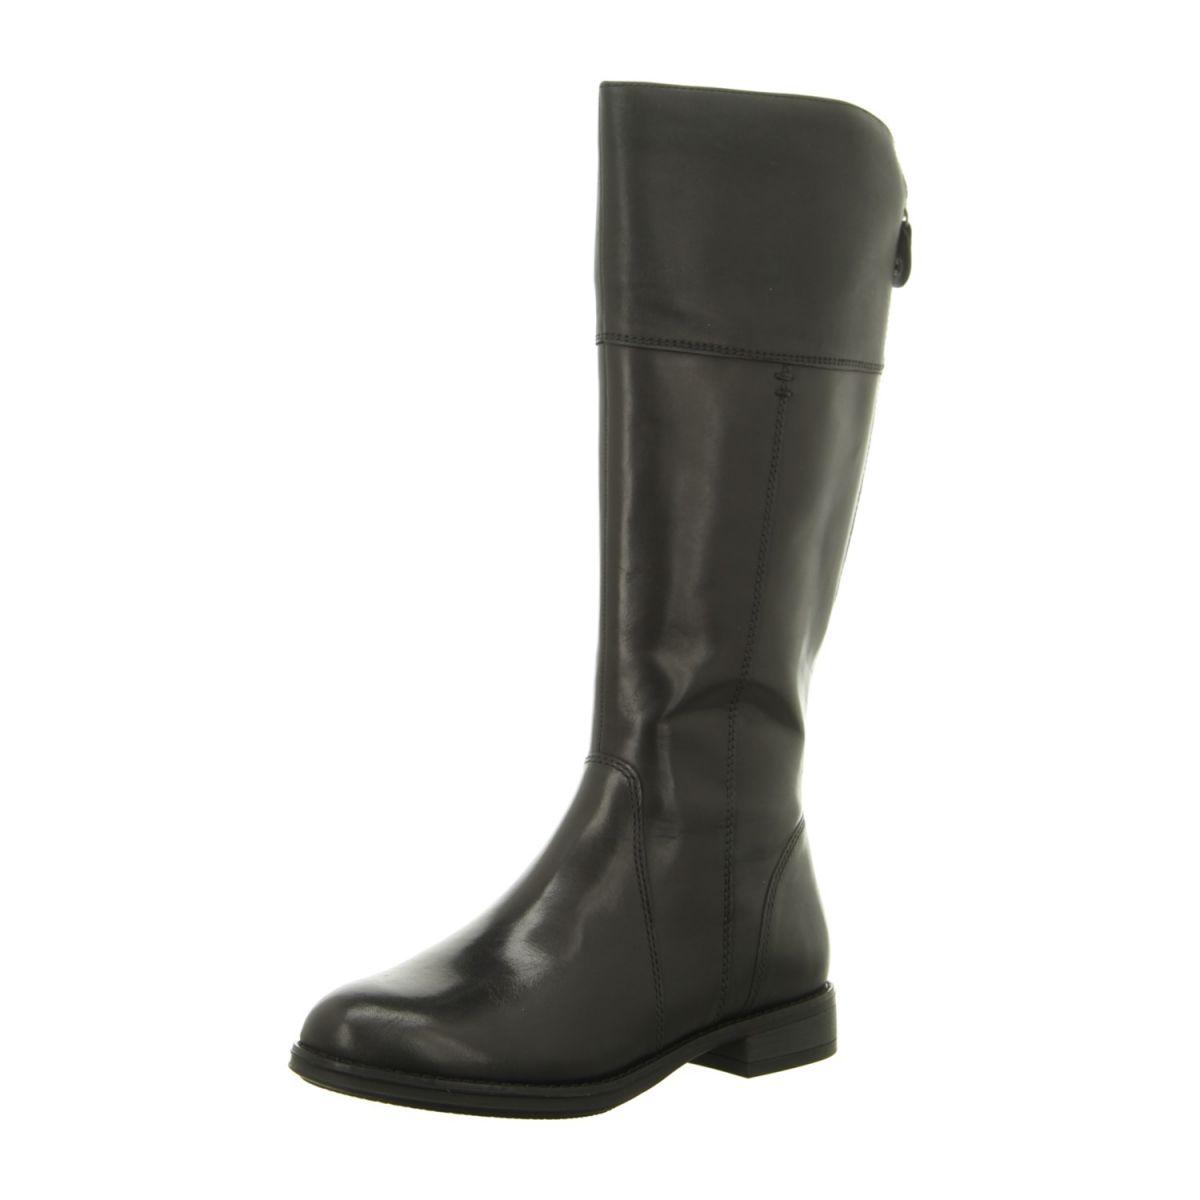 NEU: Tamaris Stiefel 1 1 25530 27 001 black | Schuhe